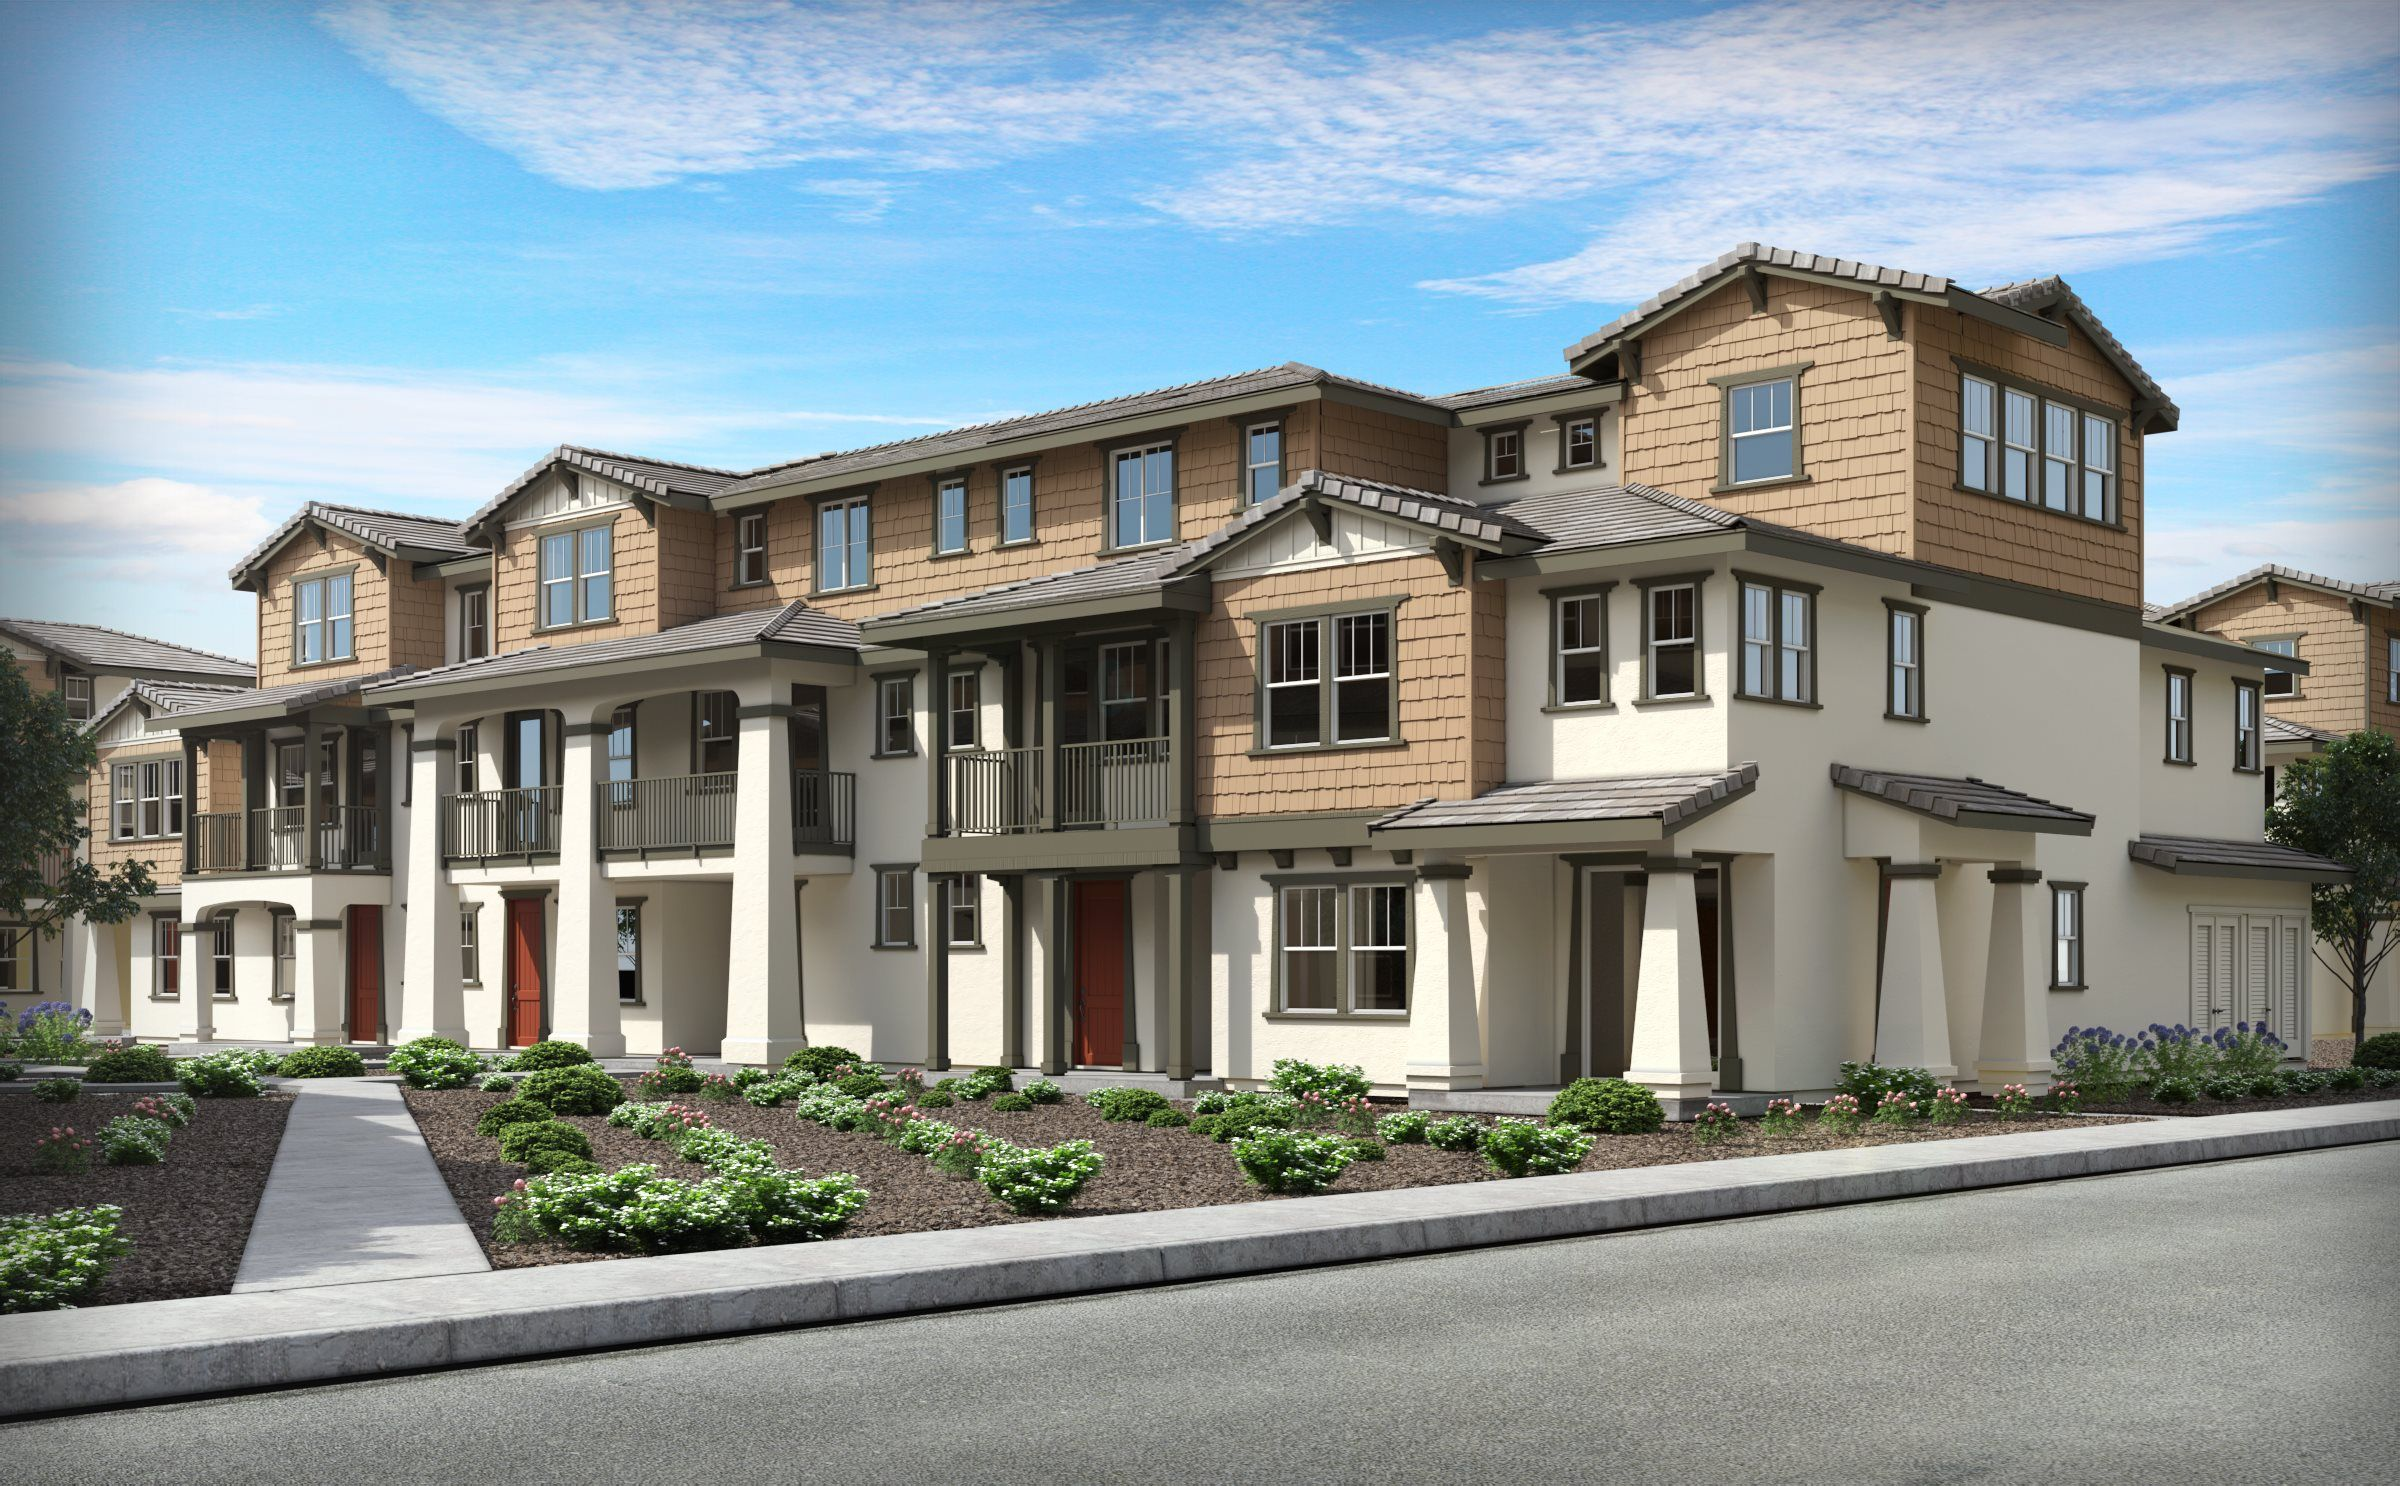 'The Preserve - Hillcrest' by Lennar - Bay Area Homebuilding in Oakland-Alameda